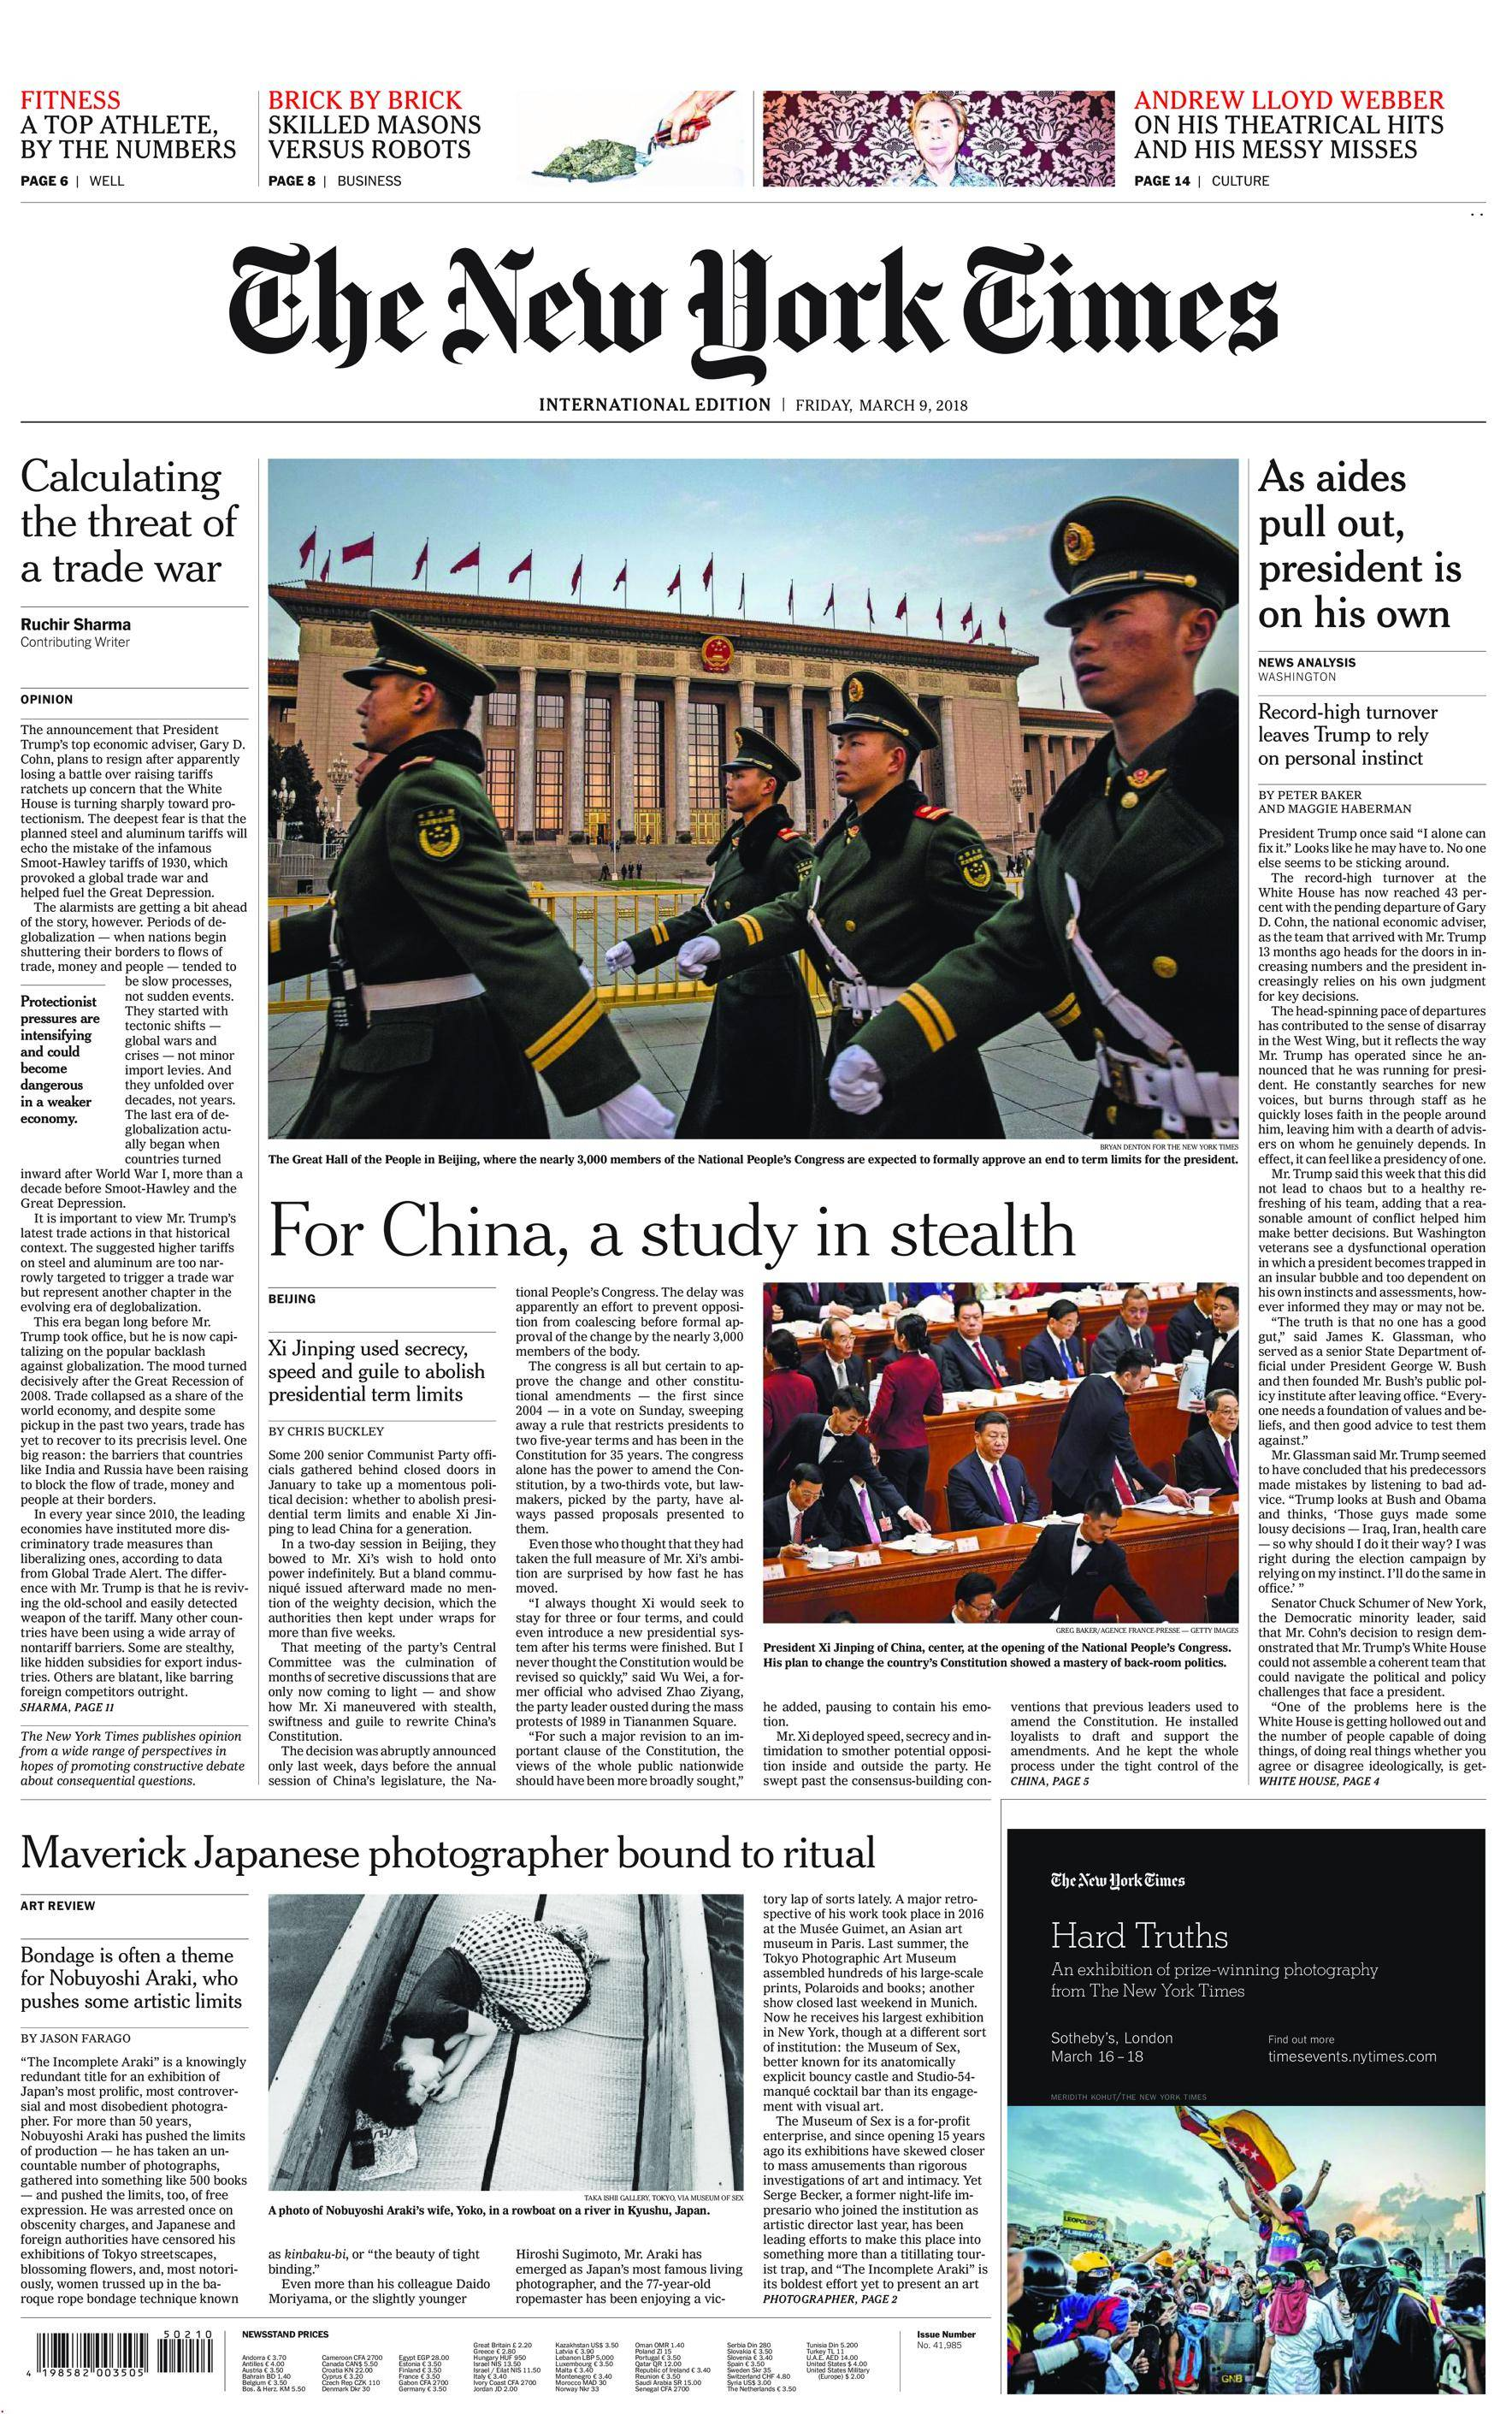 International New York Times - 09 March 2018